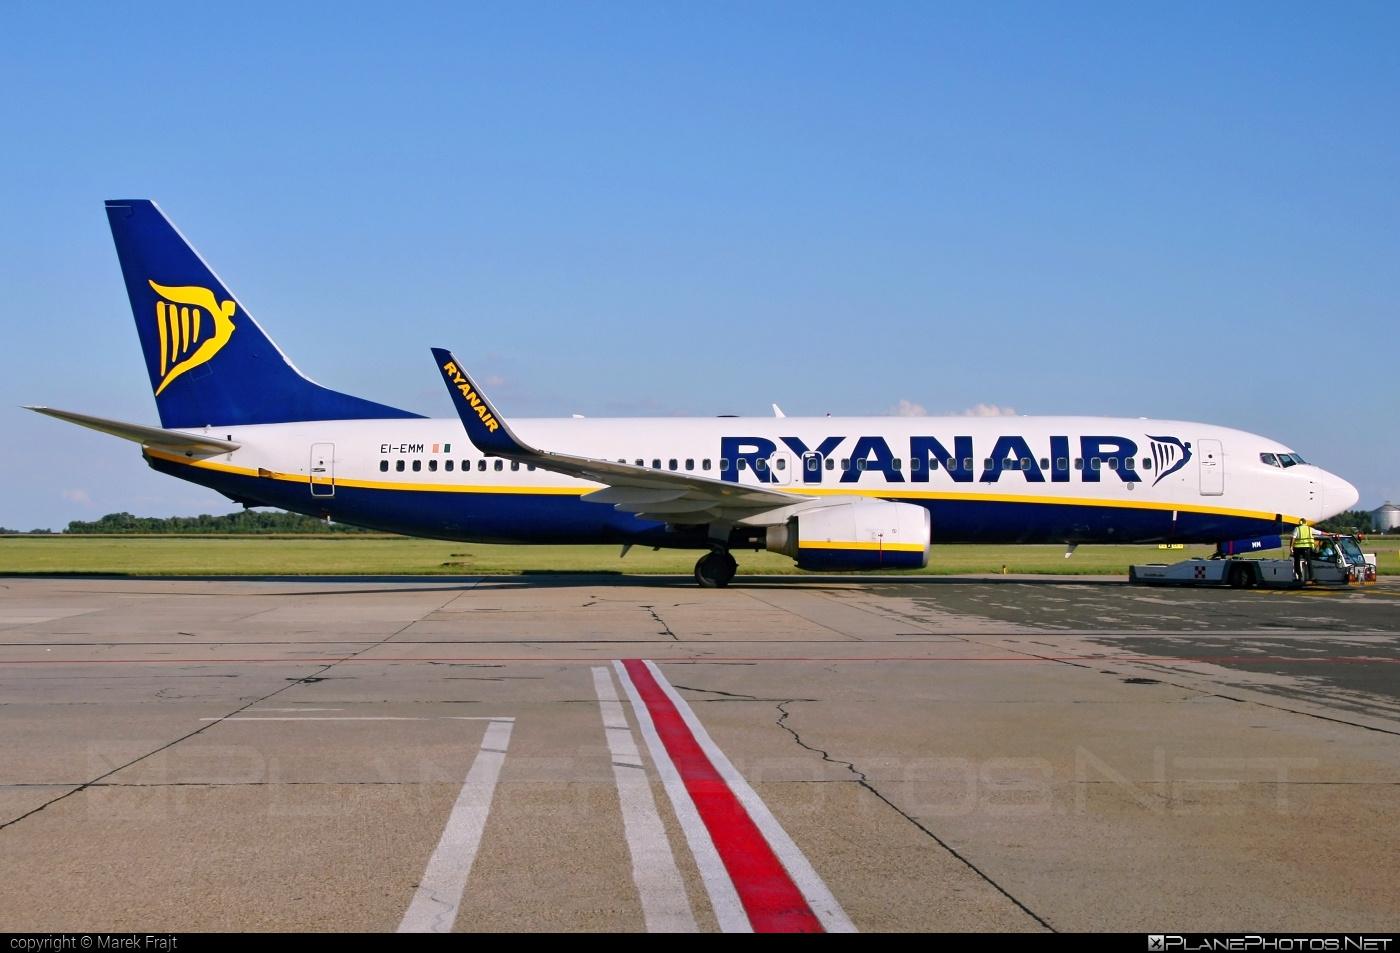 Boeing 737-800 - EI-EMM operated by Ryanair #b737 #b737nextgen #b737ng #boeing #boeing737 #ryanair